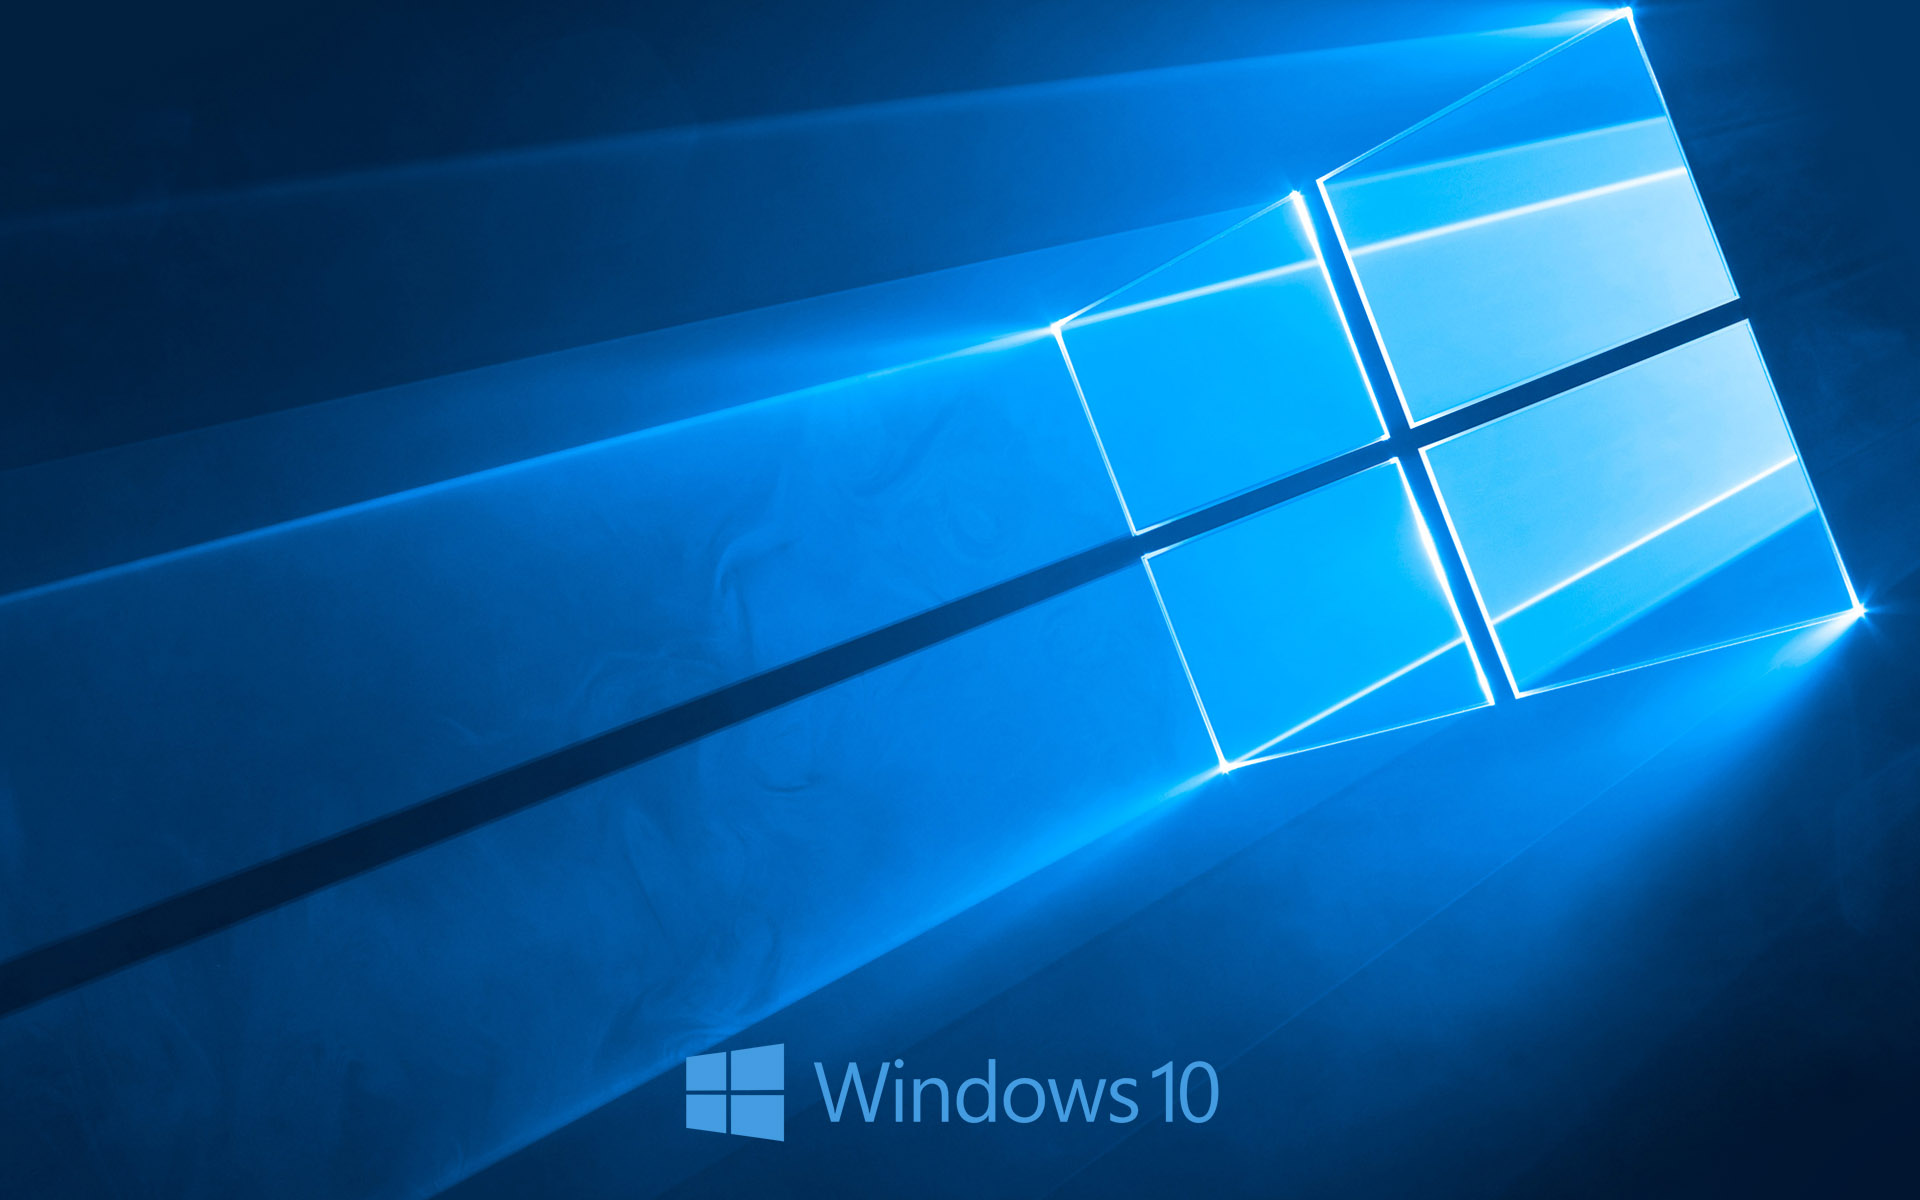 37 Windows 10 Mobile Official Wallpapers On Wallpapersafari